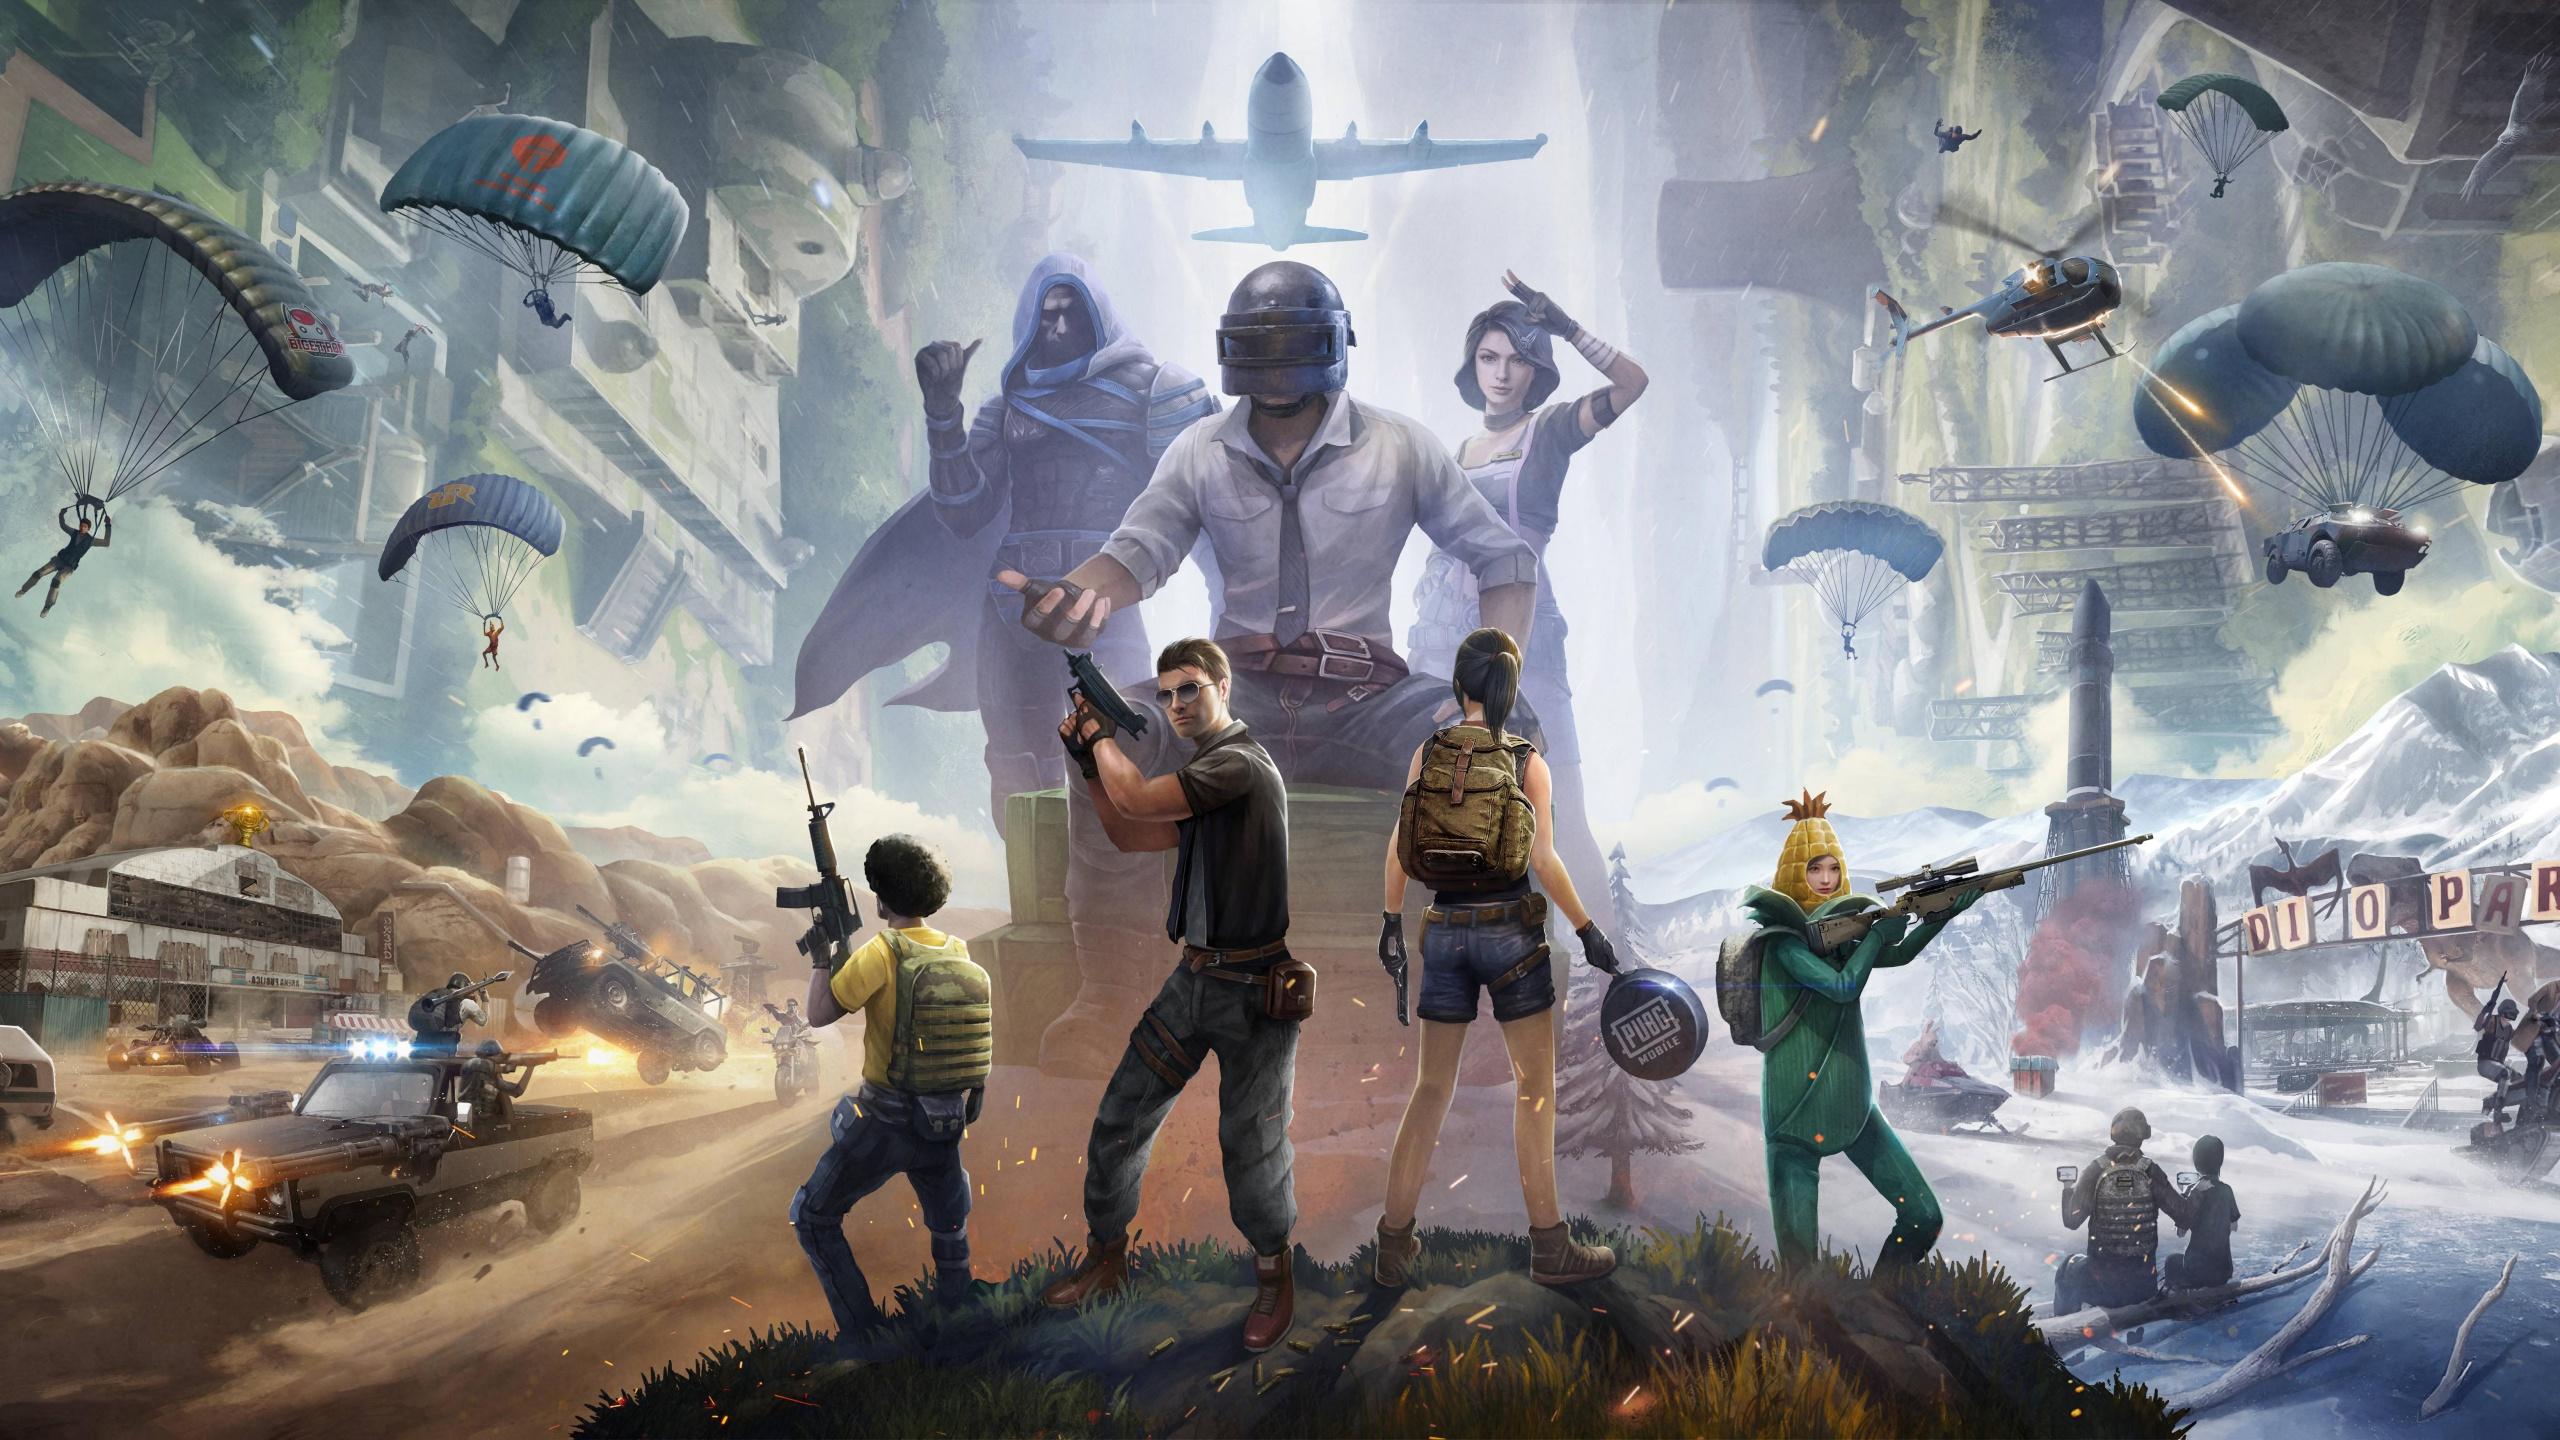 Pubg 4k Wallpaper Playerunknown S Battlegrounds 2020 Games 5k 8k Games 218